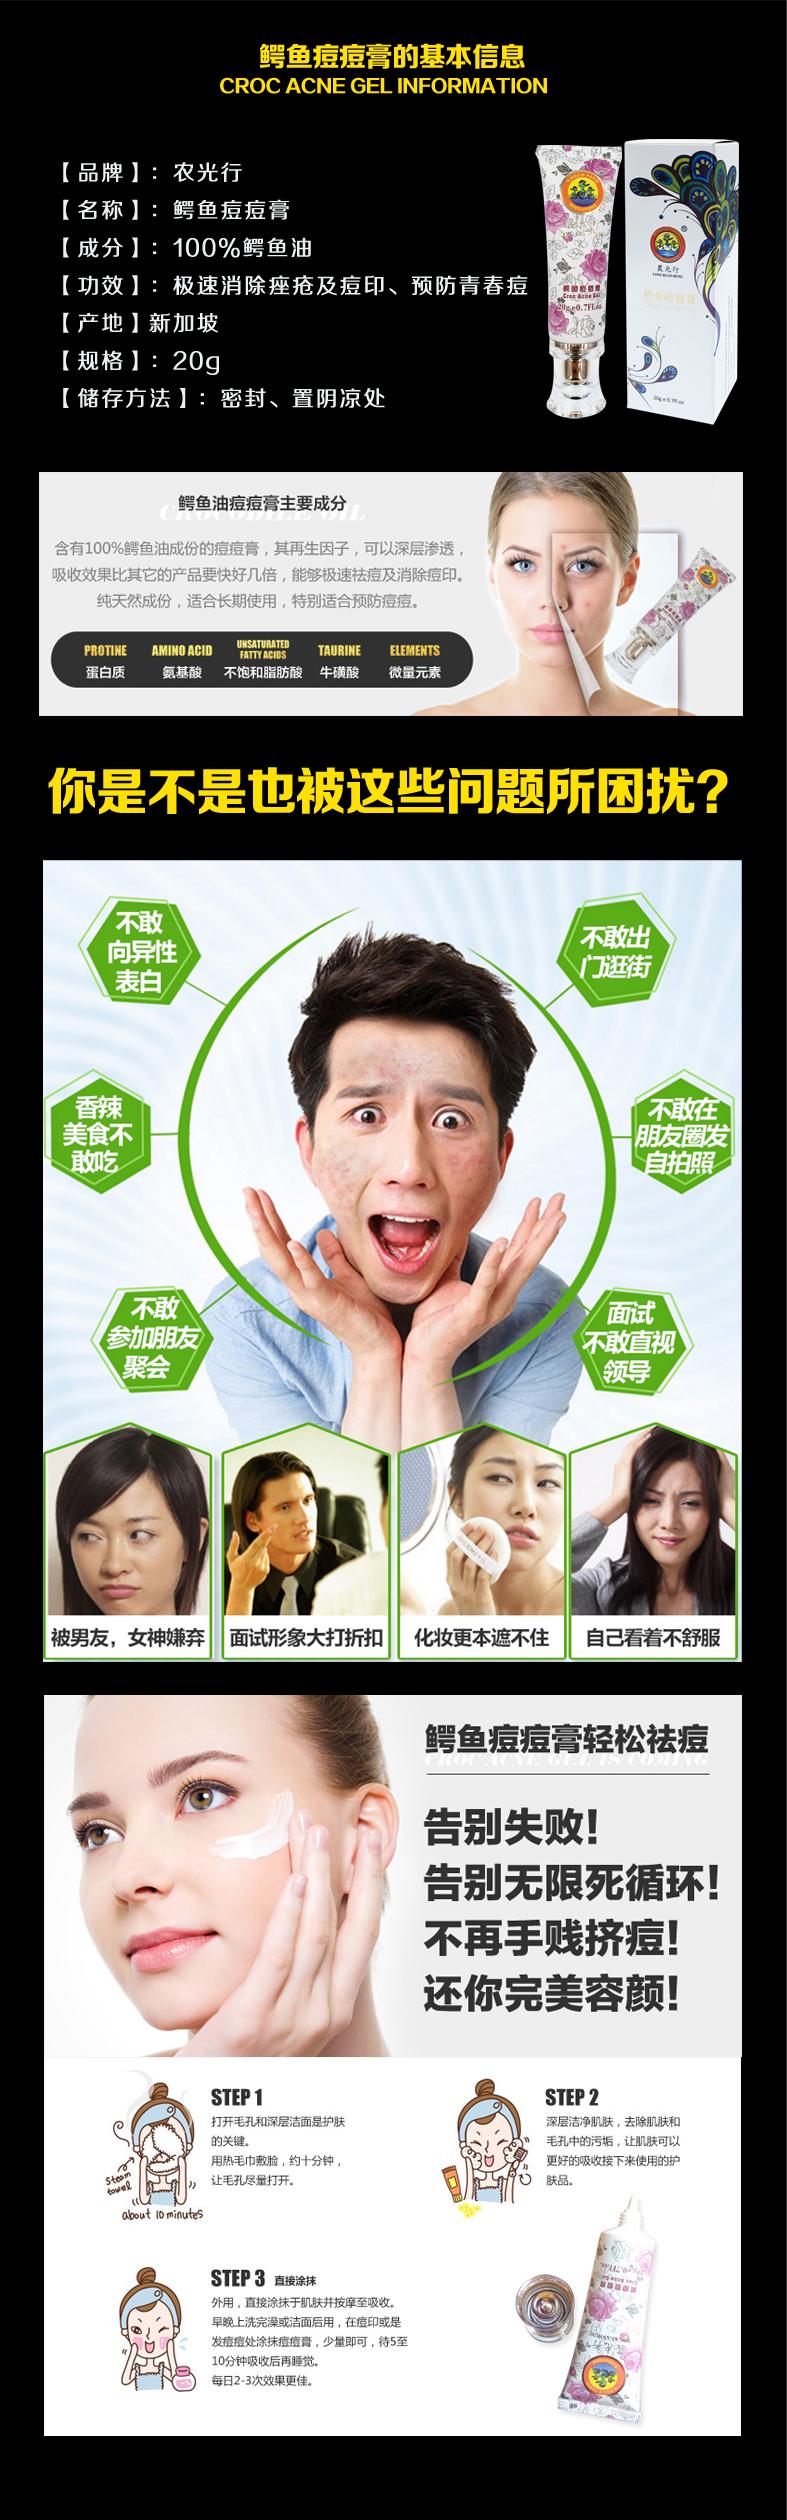 Long Kuan Hung Acne Pimple Cream Gel Benefits 农光行鳄鱼油痘痘膏